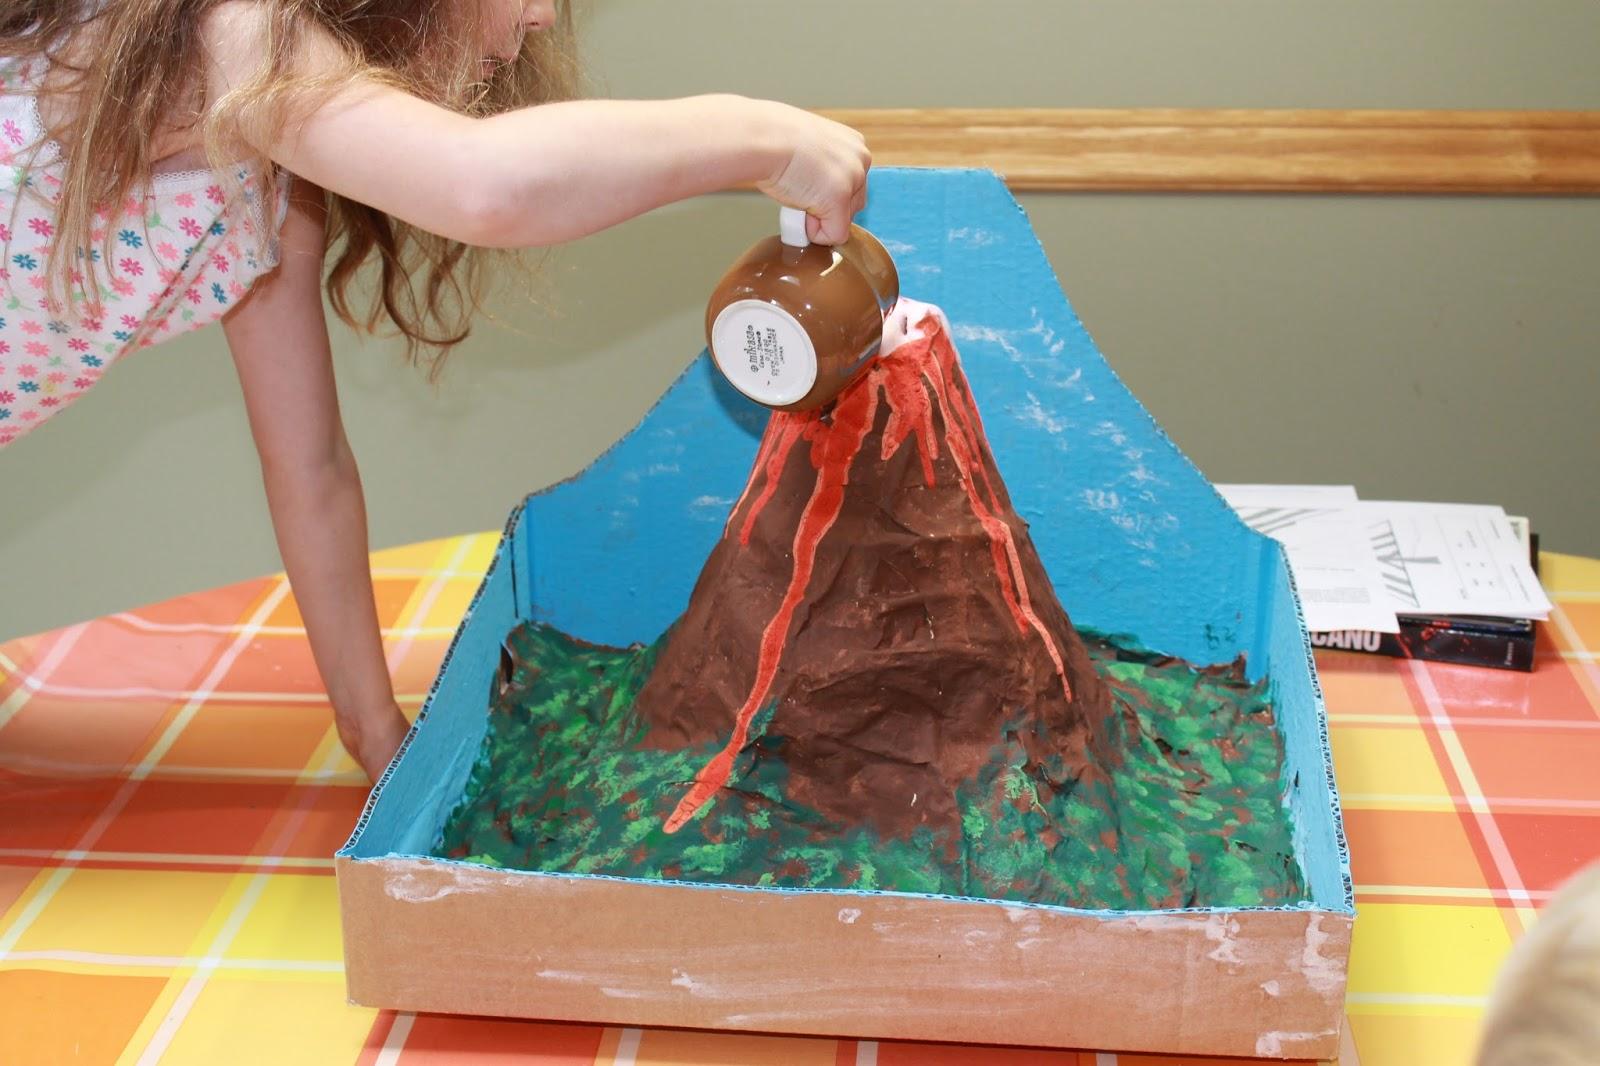 Worksheet Baking Soda Volcano Experiment baking soda volcano experiment scalien scalien